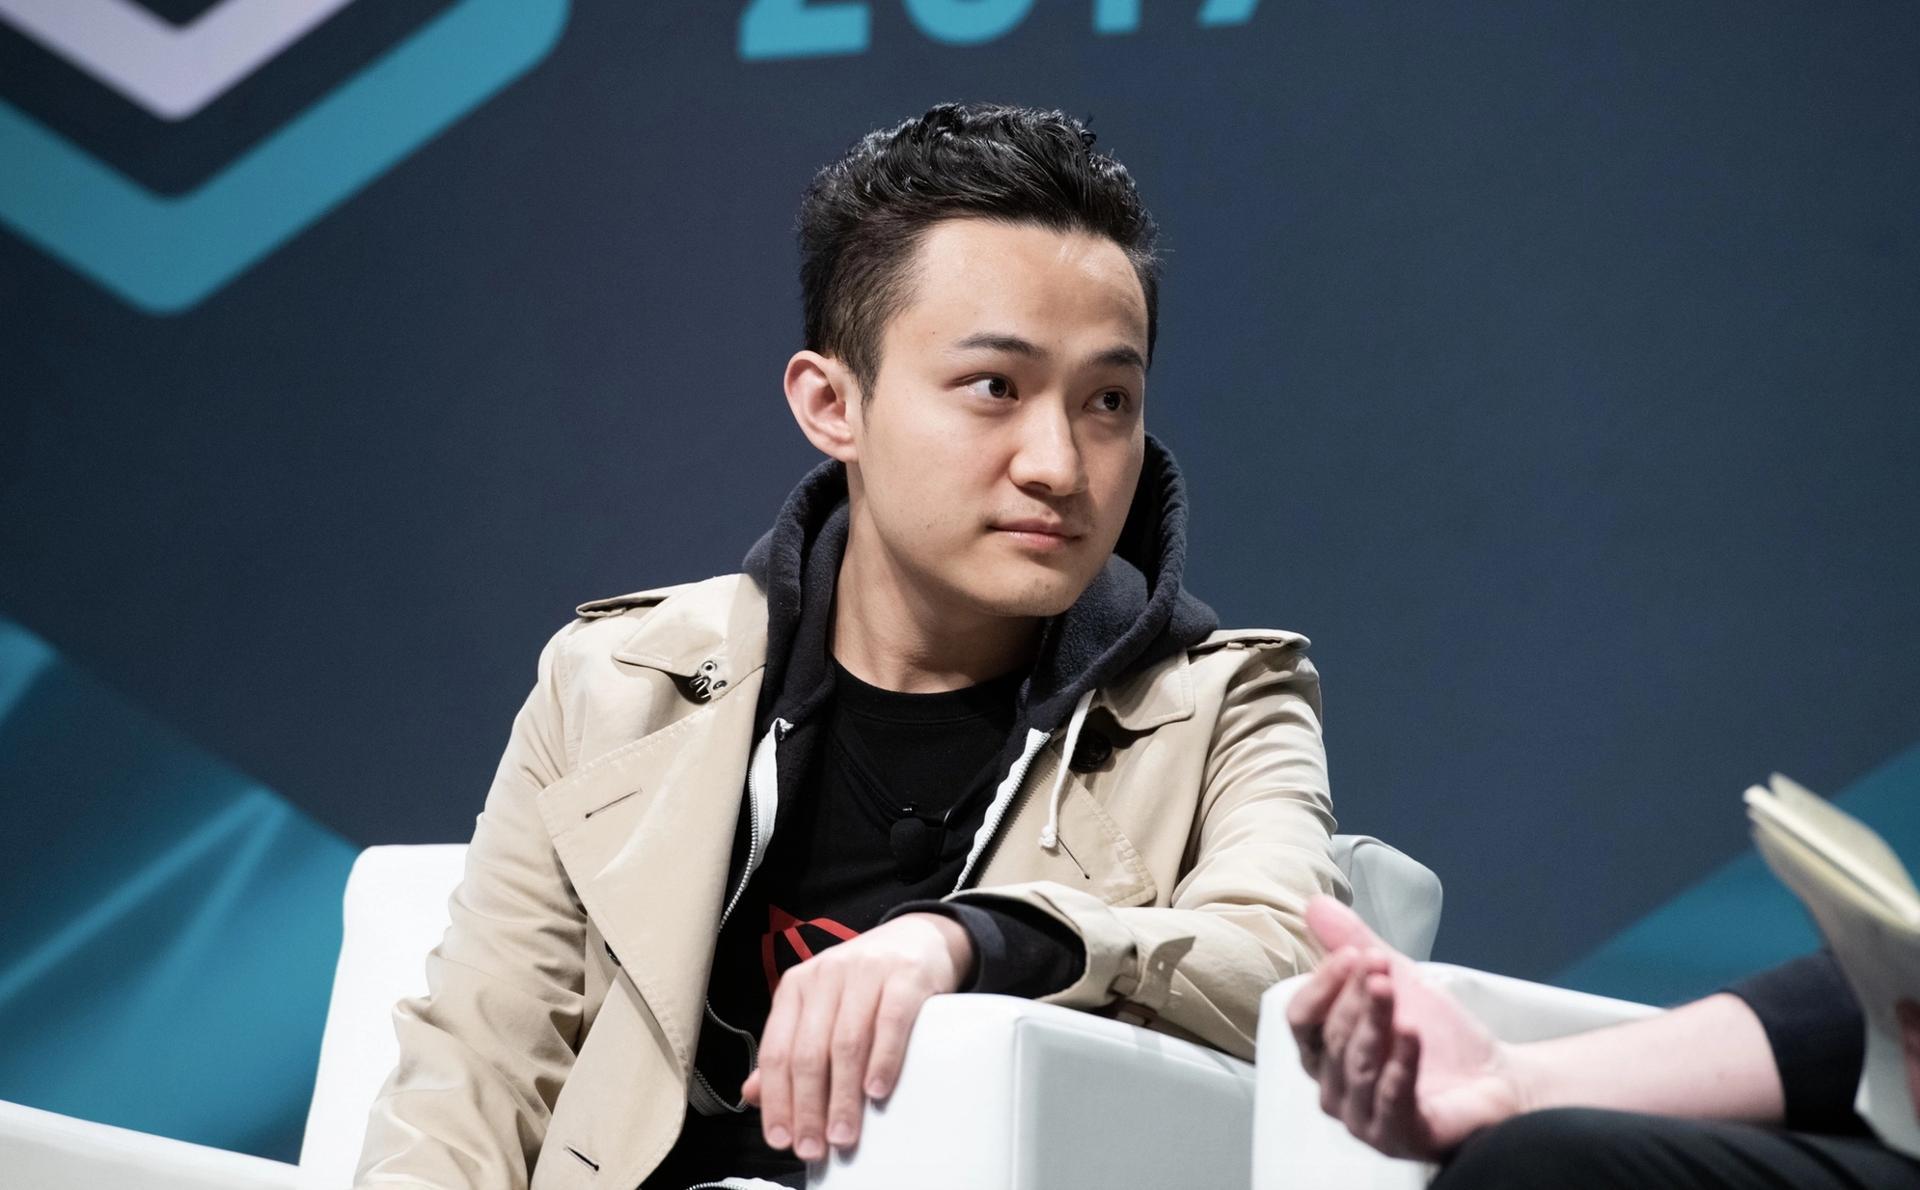 31-year-old TRON blockchain founder Justin Sun Wikipedia